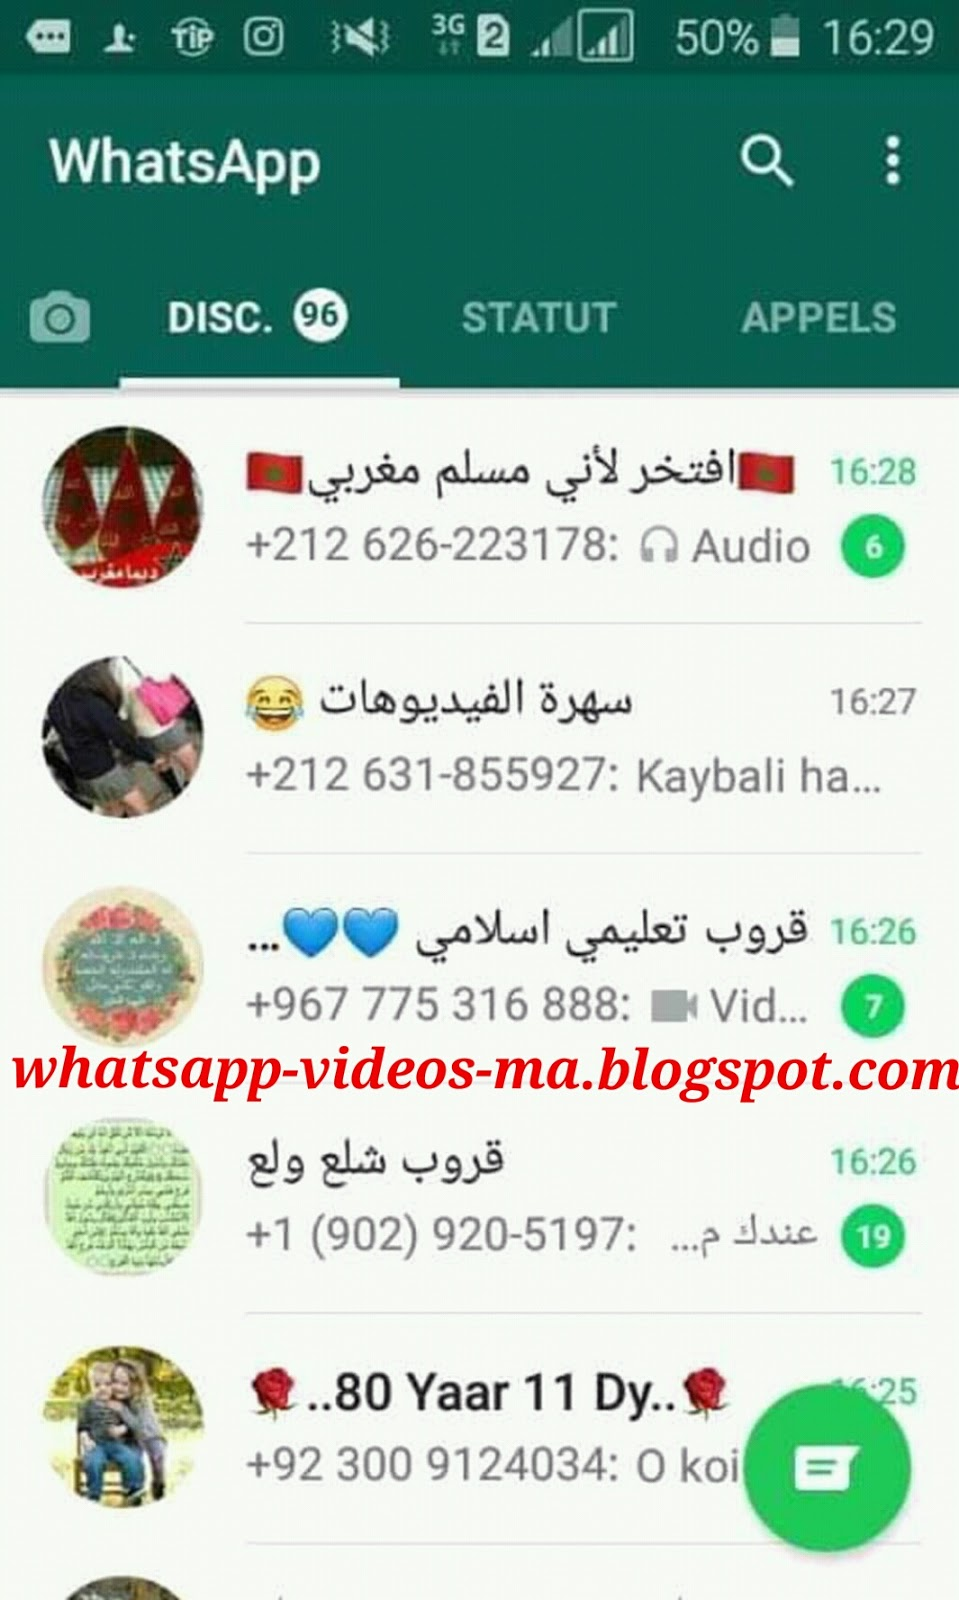 New Group Whatsapp Maroc Link 2018 - whatsapp videos | whatsapp groups